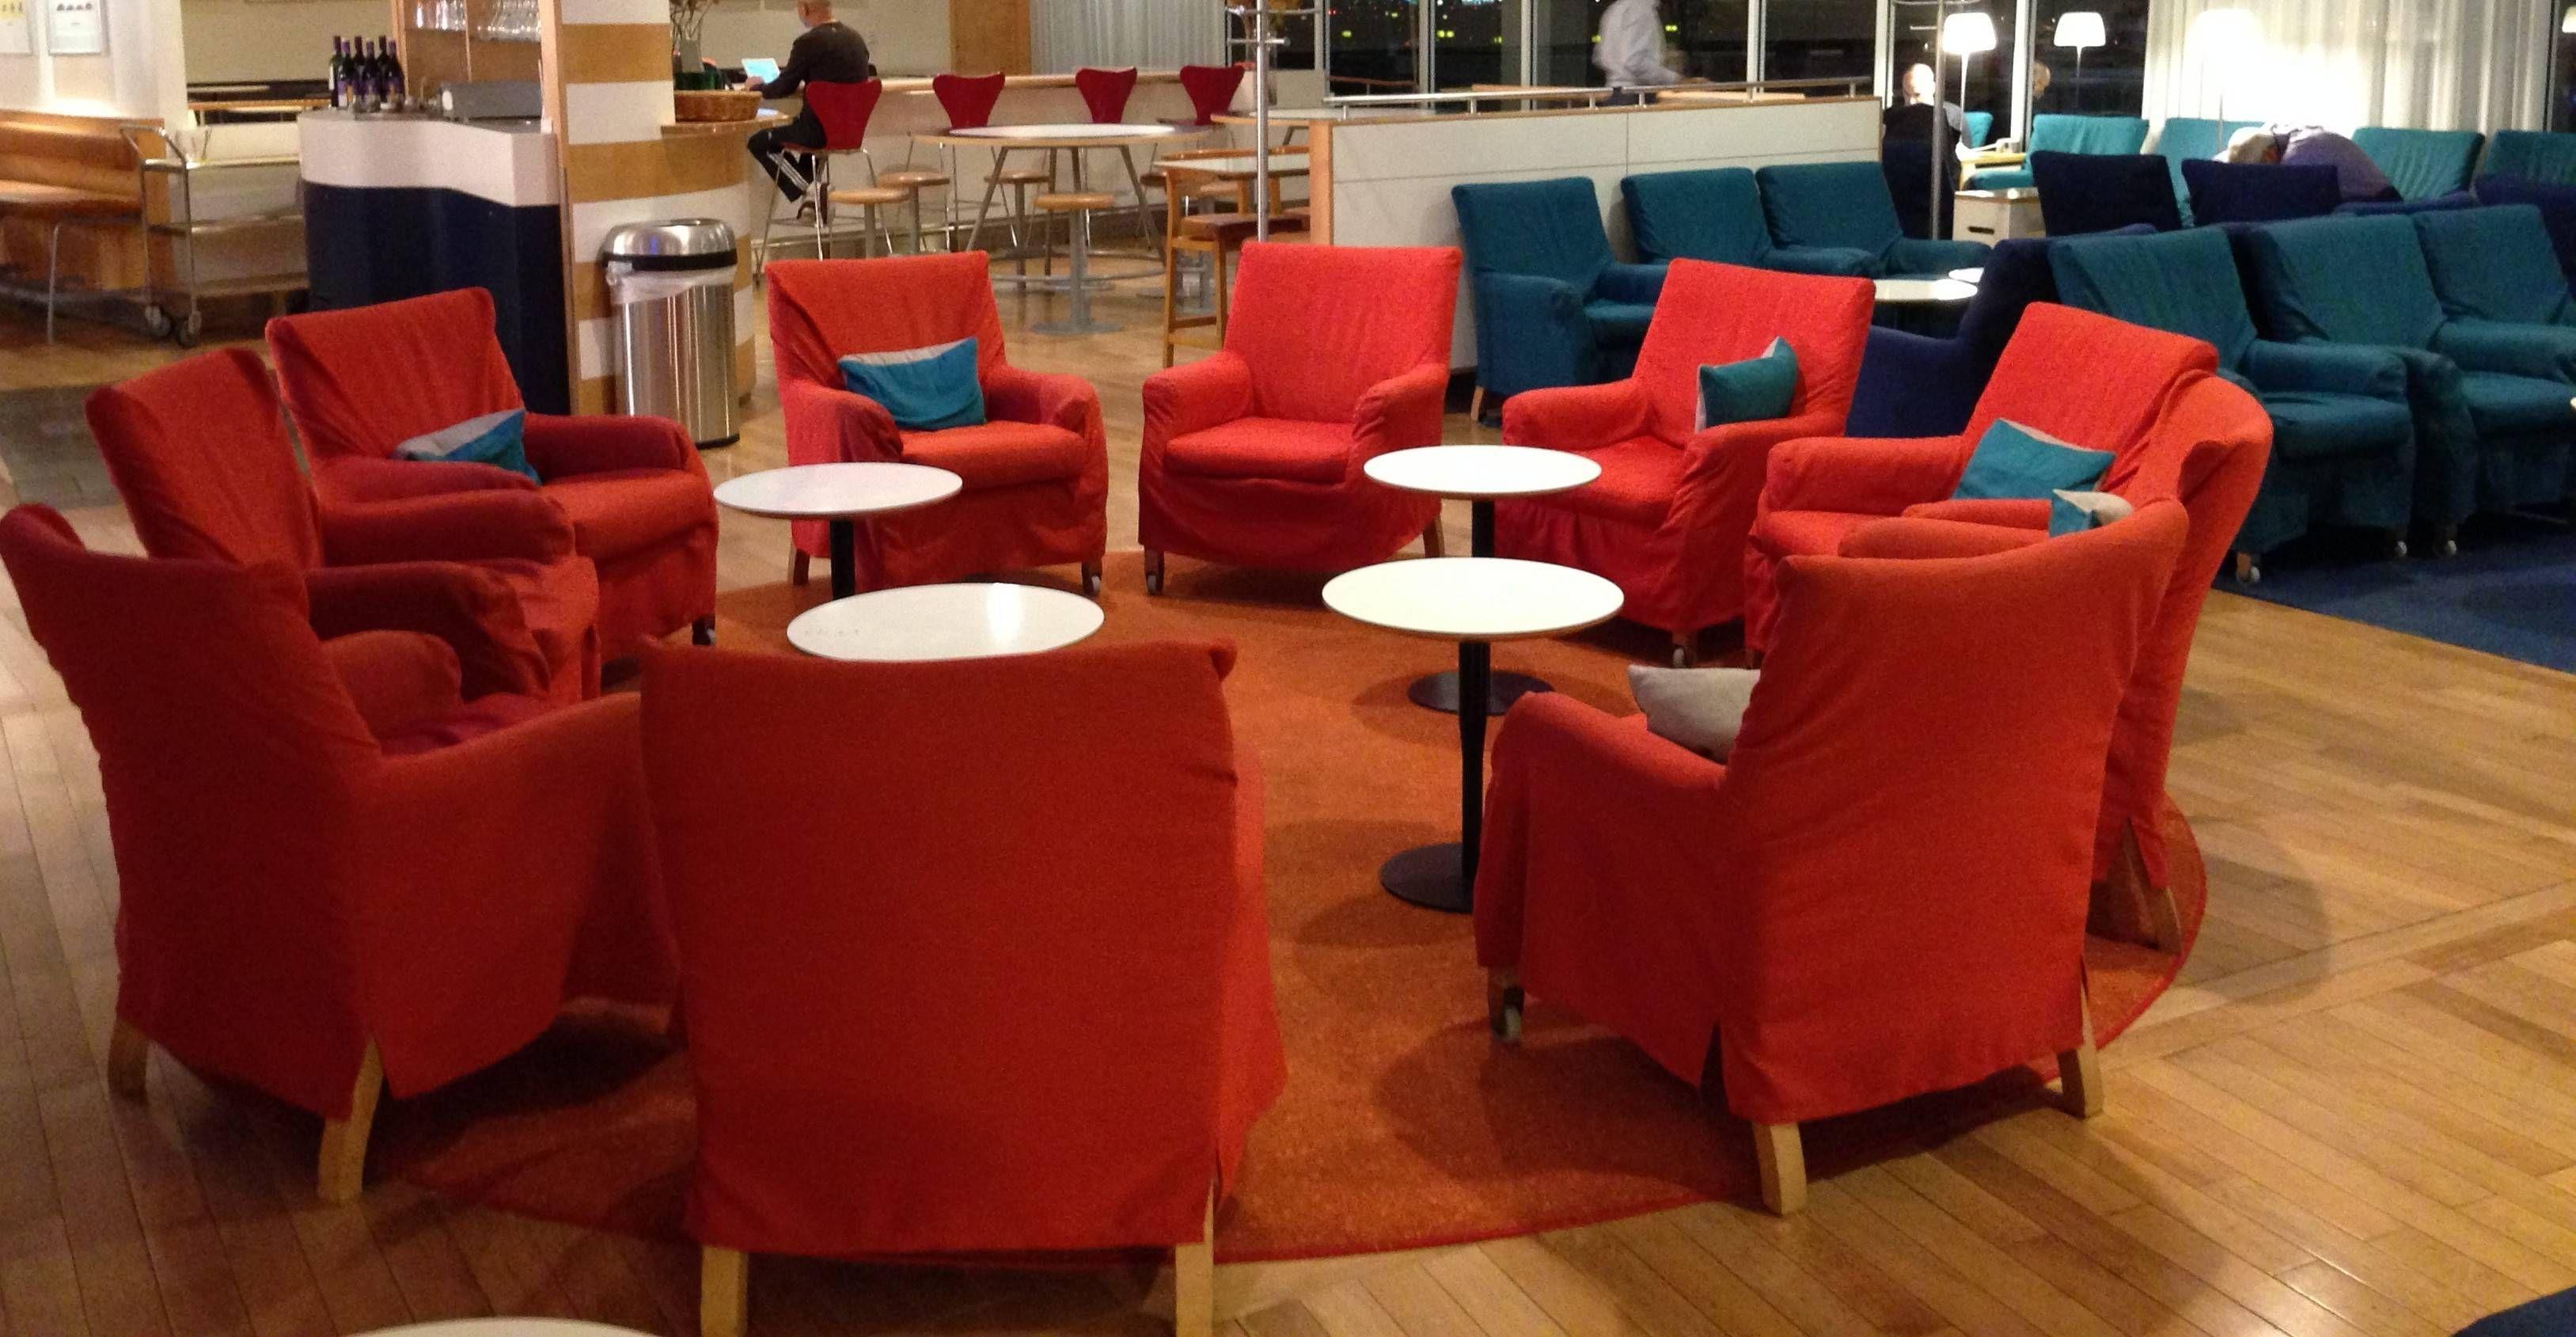 Sala VIP SAS Business Lounge no Aeroporto de Newark (EWR)